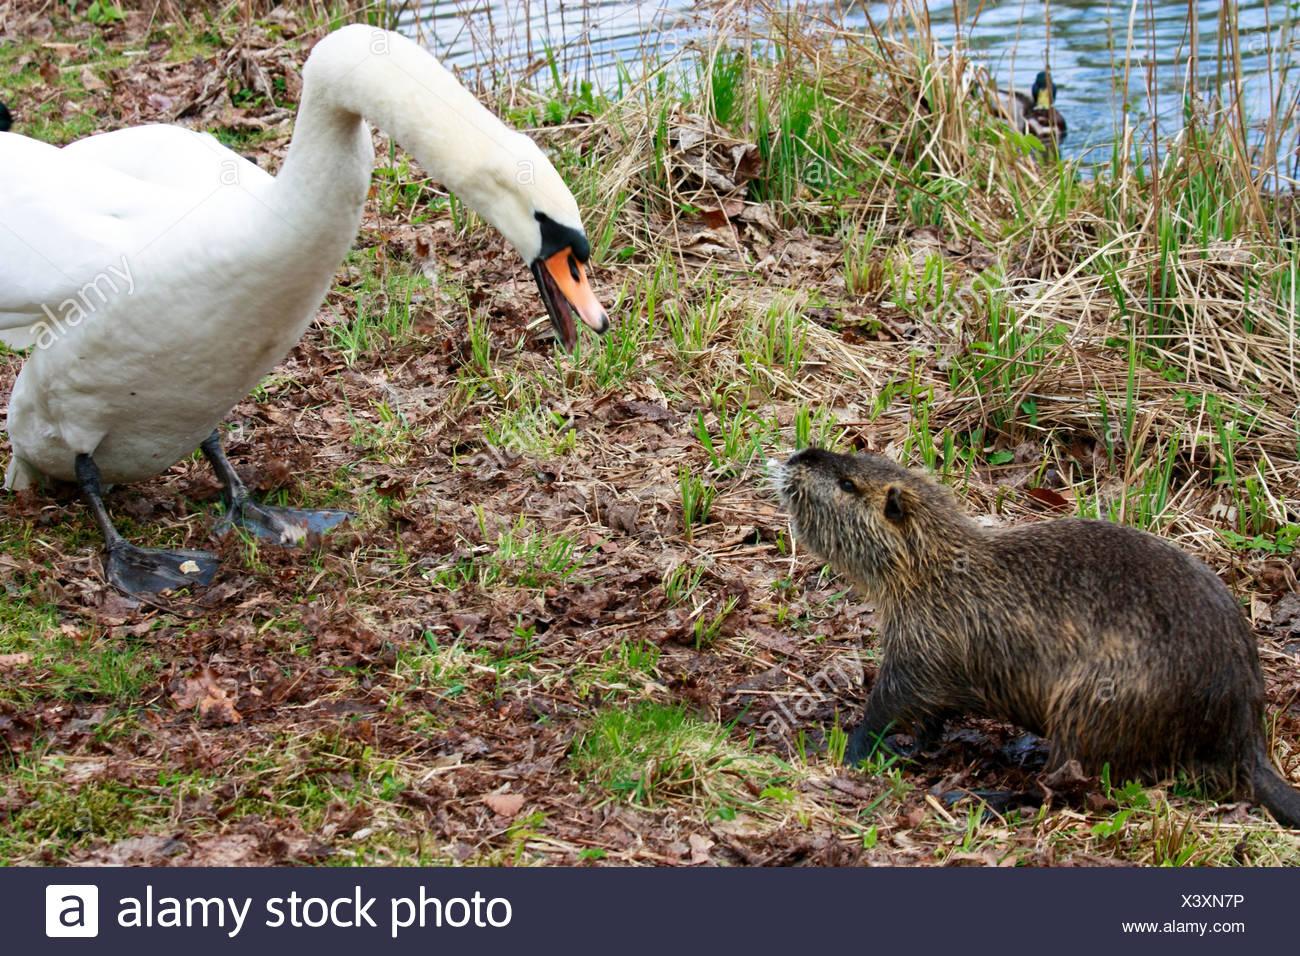 mute swan (Cygnus olor), snarling at a nutria at a water shore, Germany, Thuringia, Schlosspark Greiz, Greiz - Stock Image